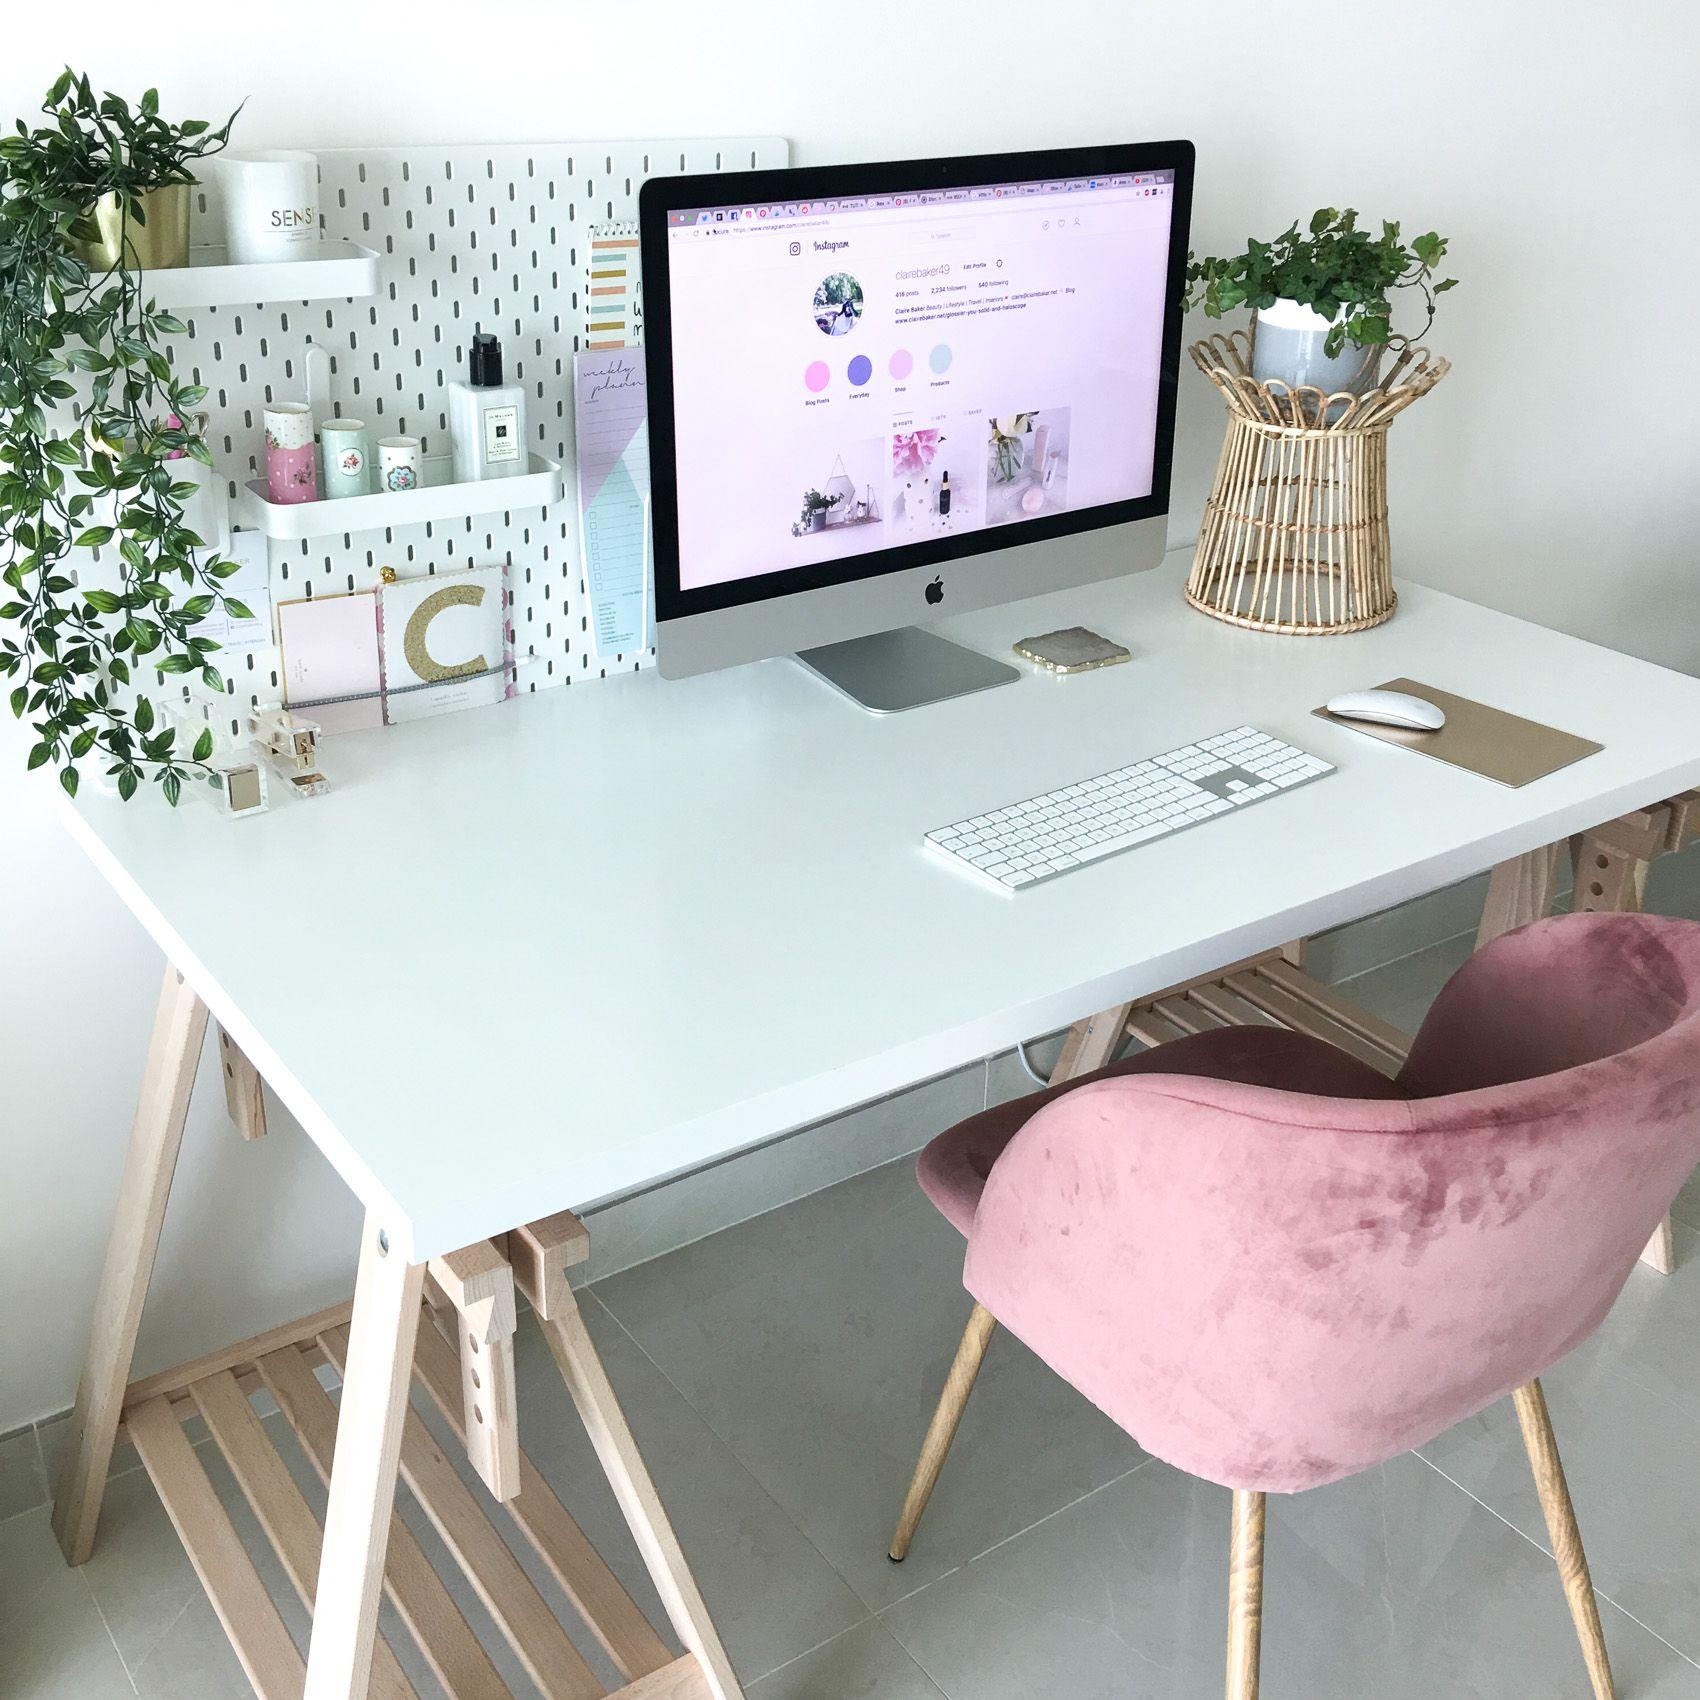 My New Desk Set Up at Home Home office desks, Office